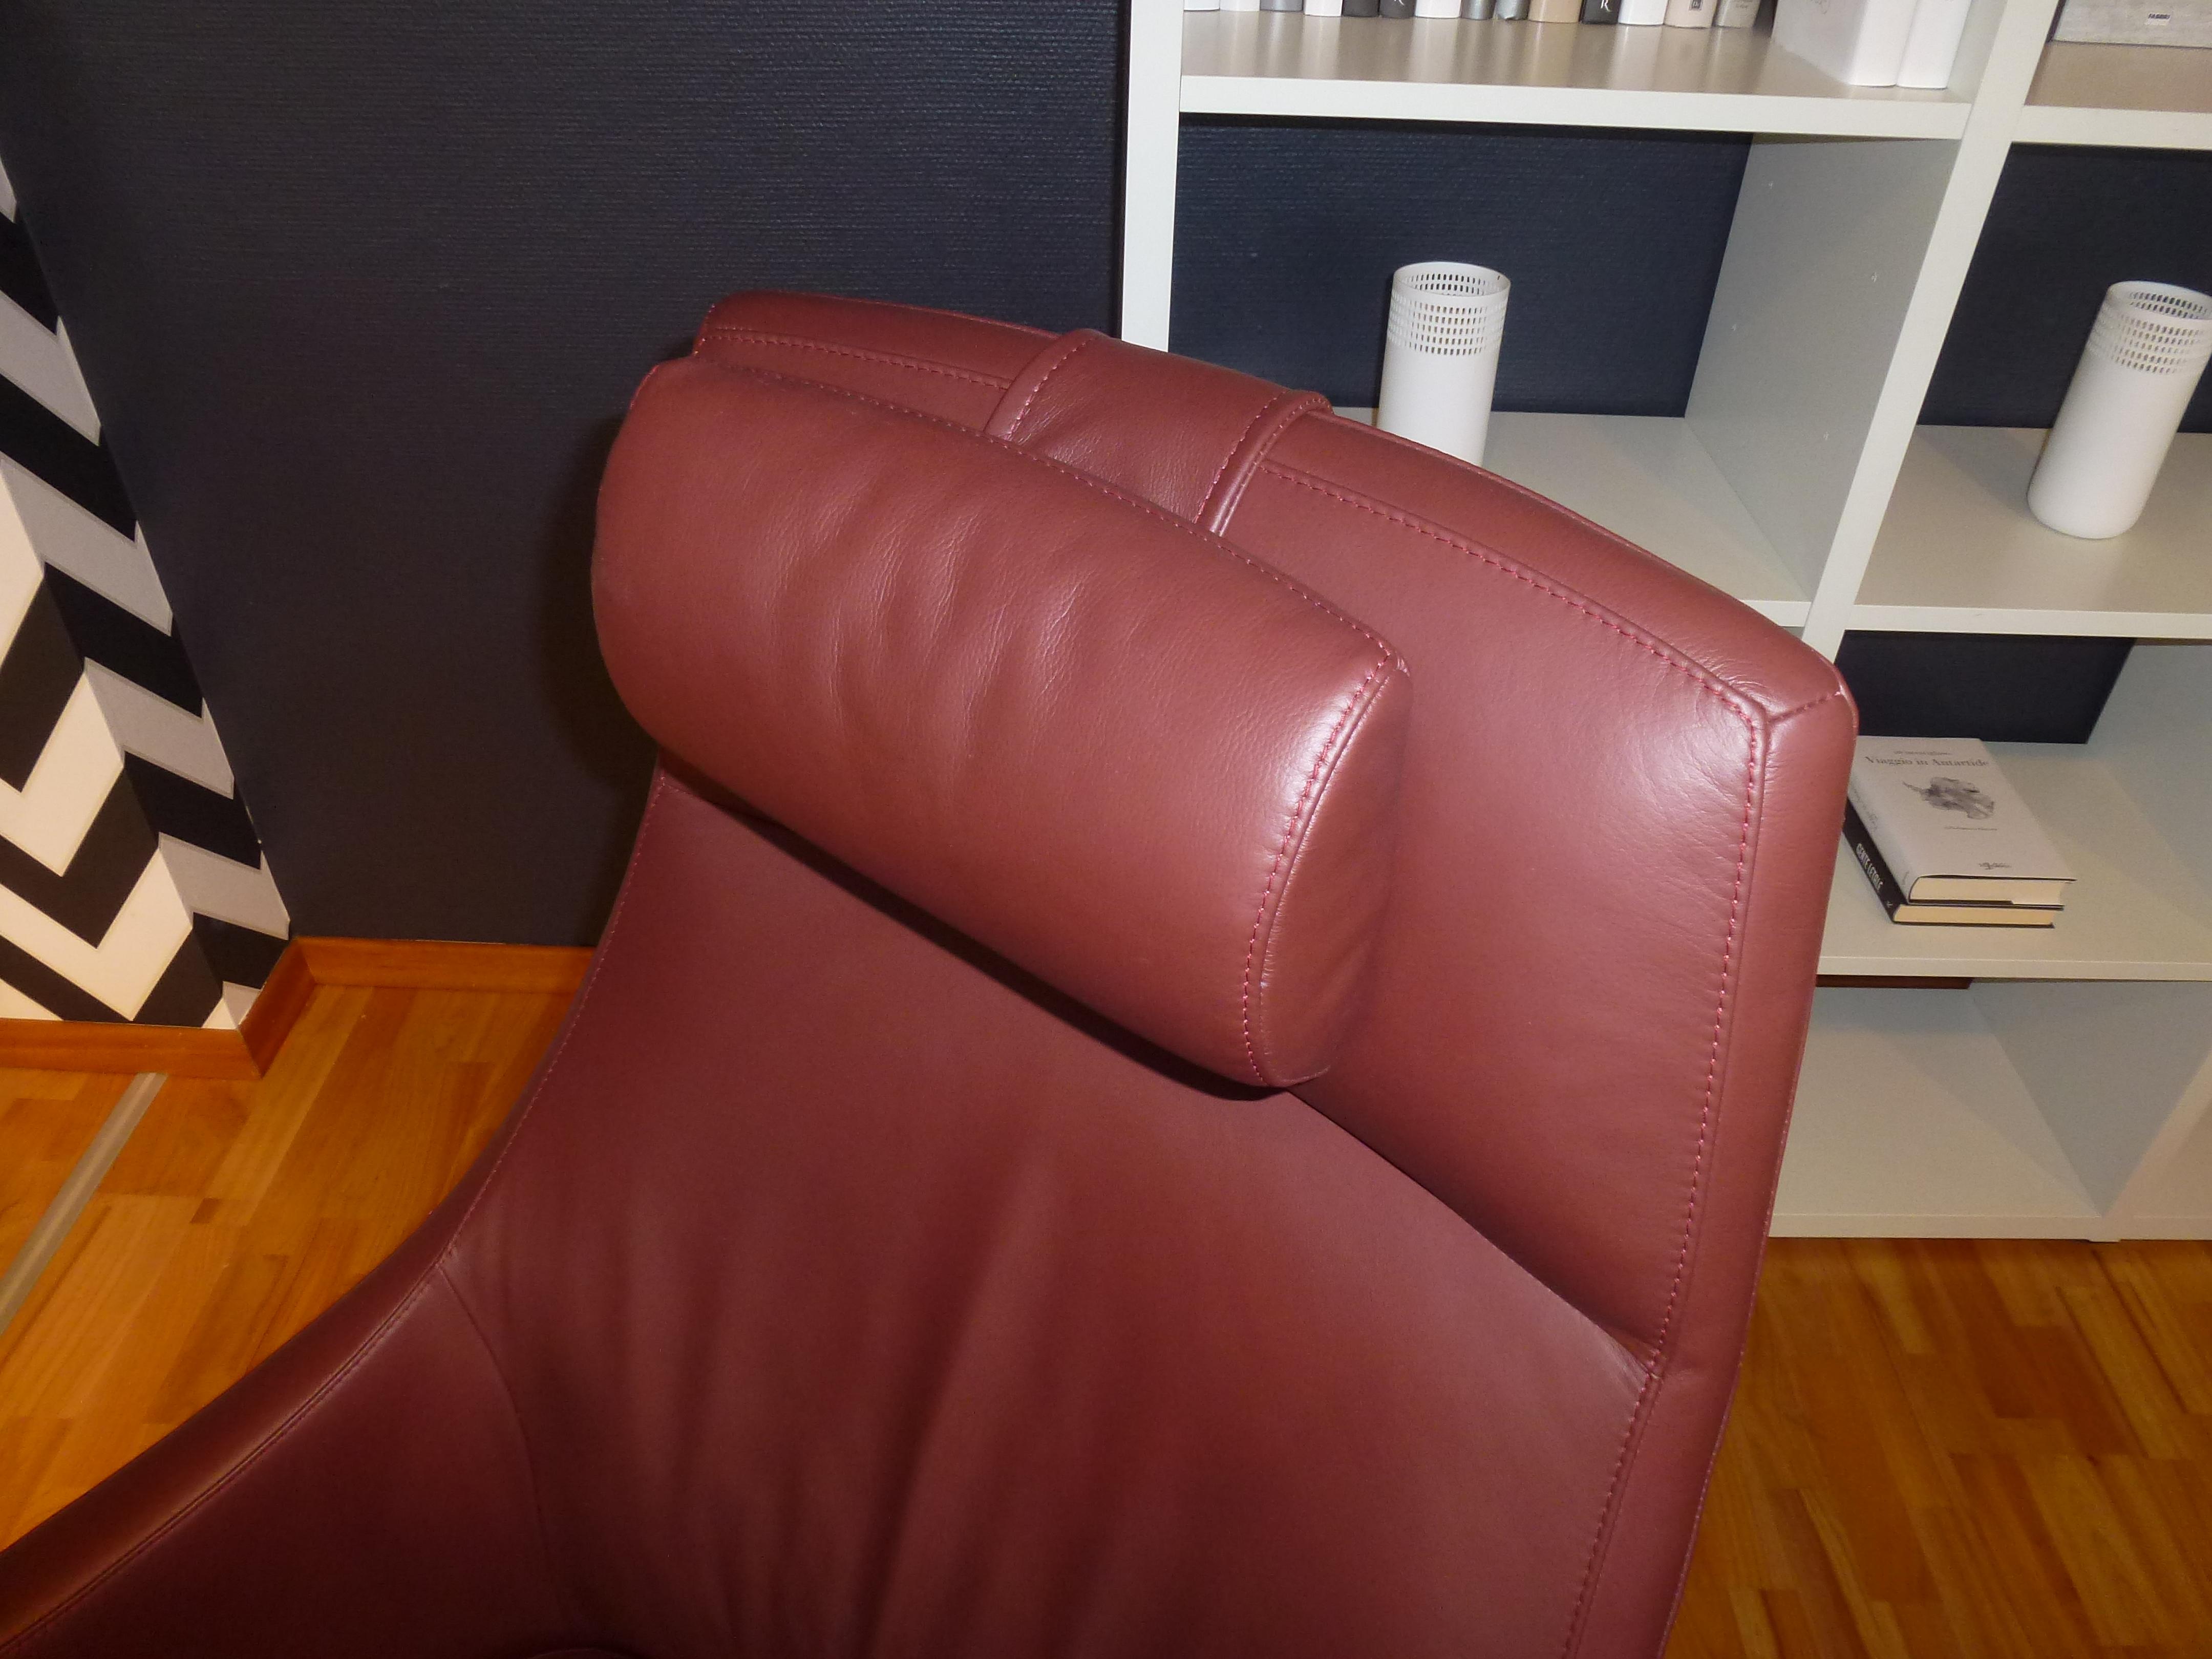 Möbel Braum Dauphin Home Sessel 4 Plus